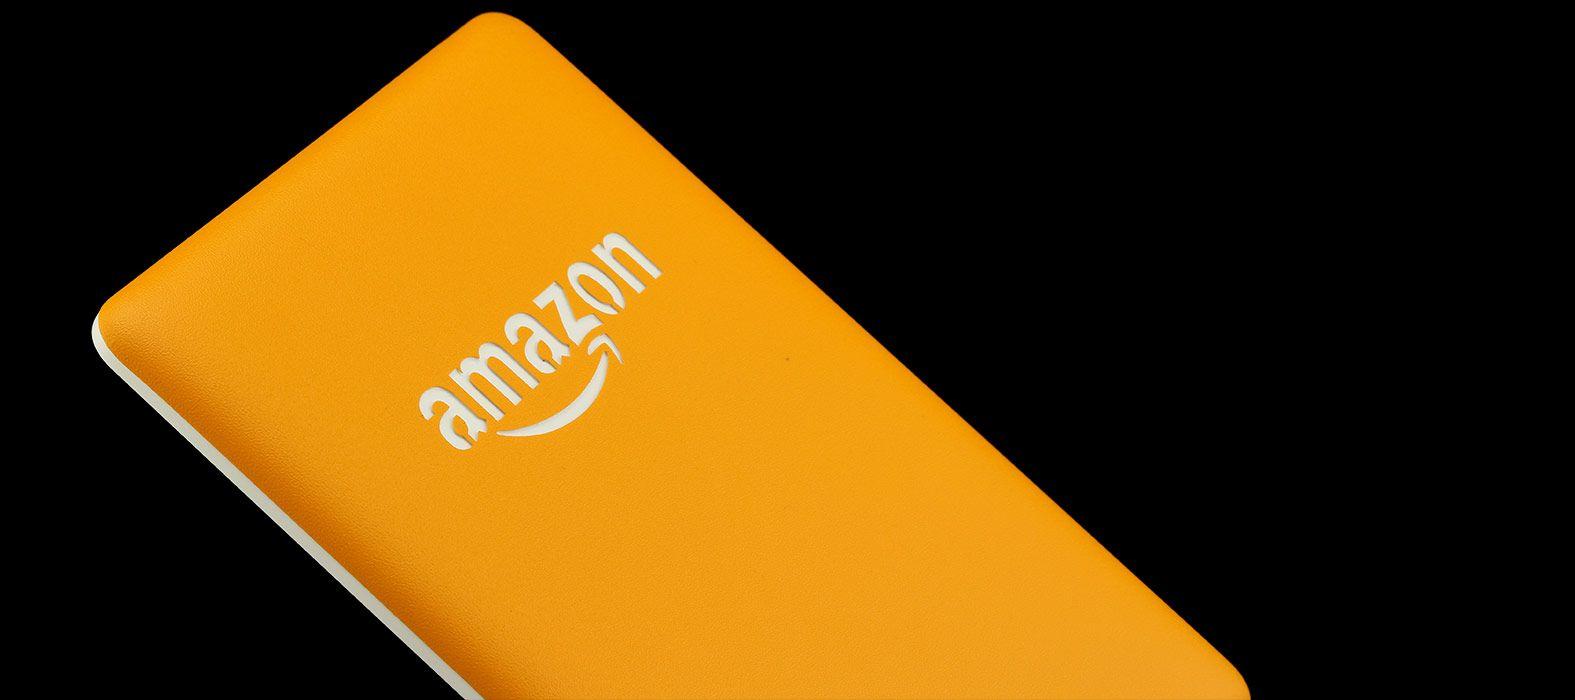 Amazon-Kindle-Paperwhite-(7th-Gen)-6-Inch-Sandstone-Yellow-Skins